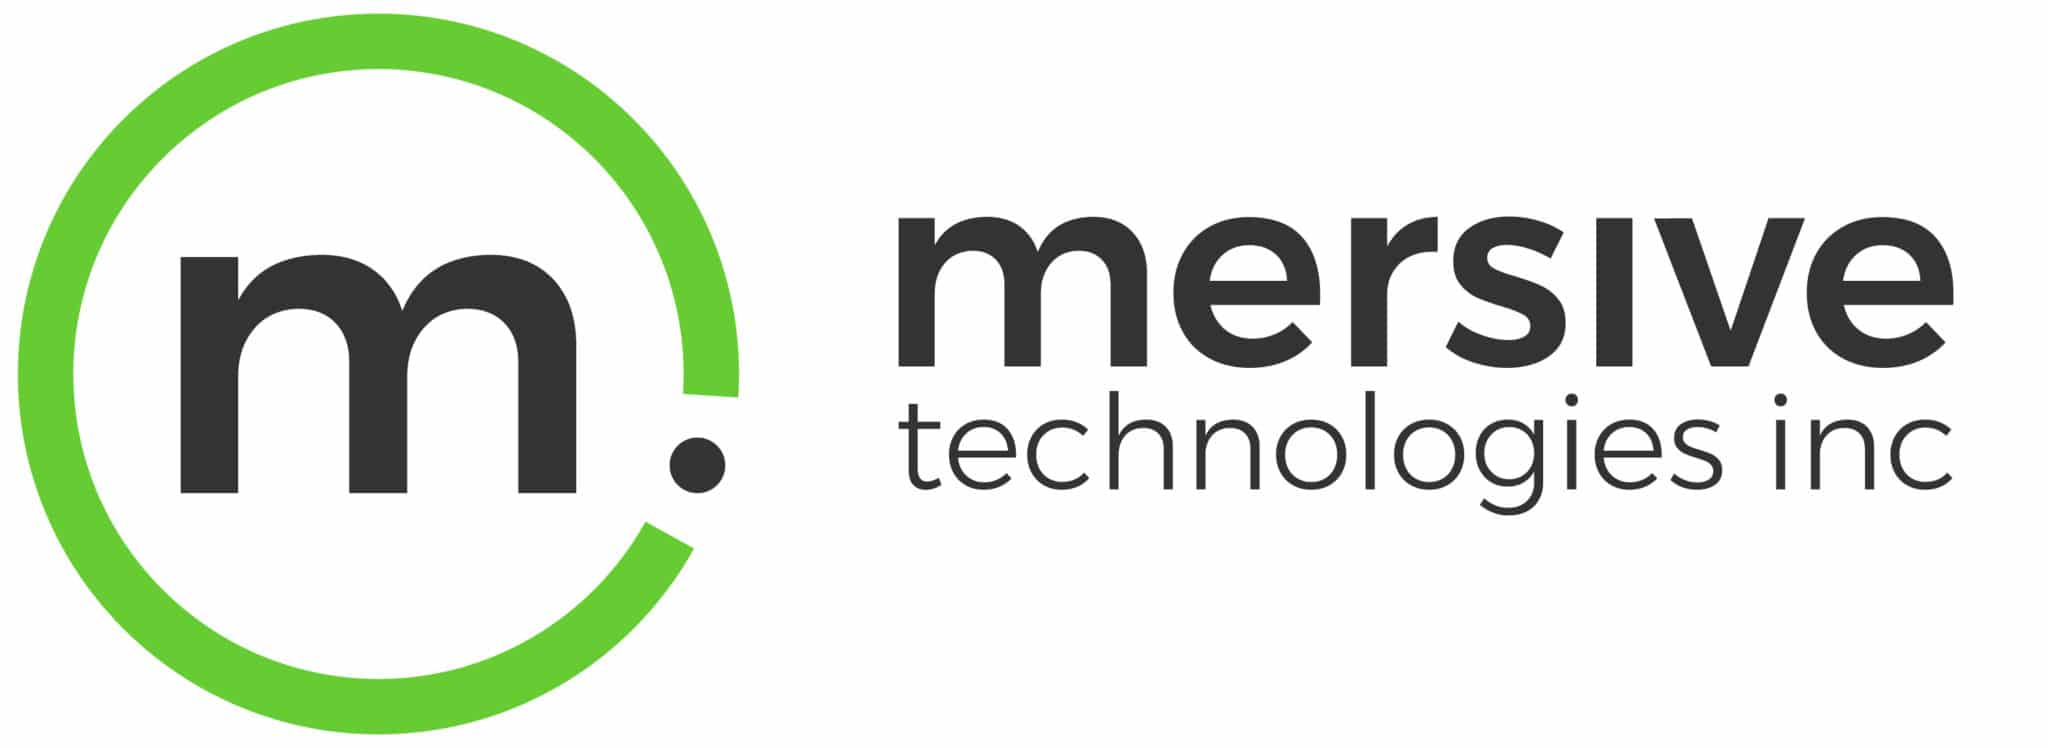 mersive technologies inc